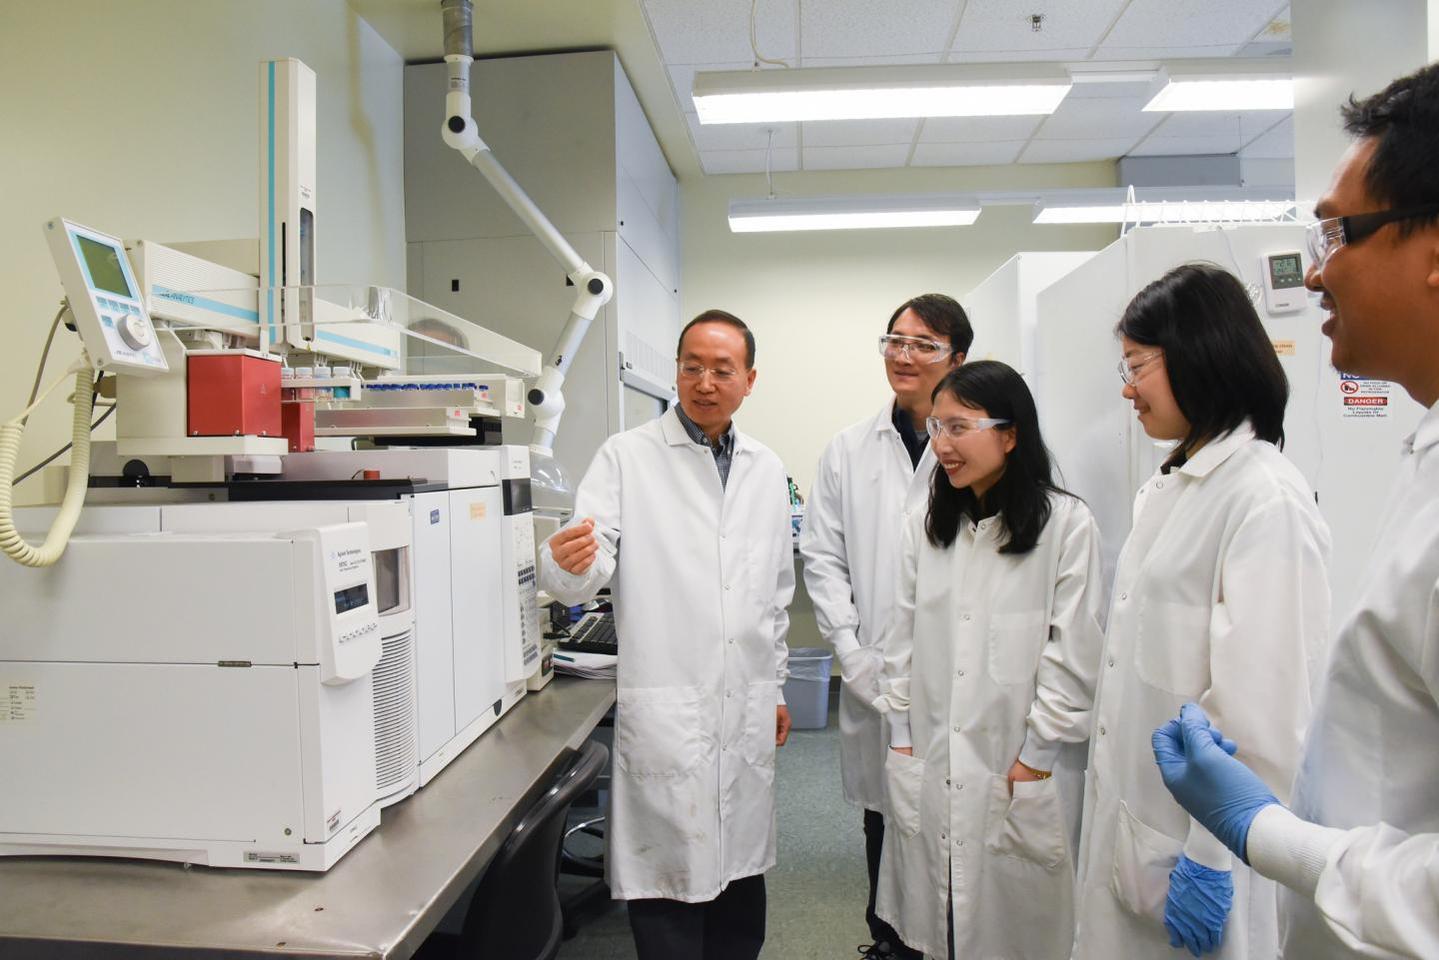 Hanwu Lei and his team at WSU